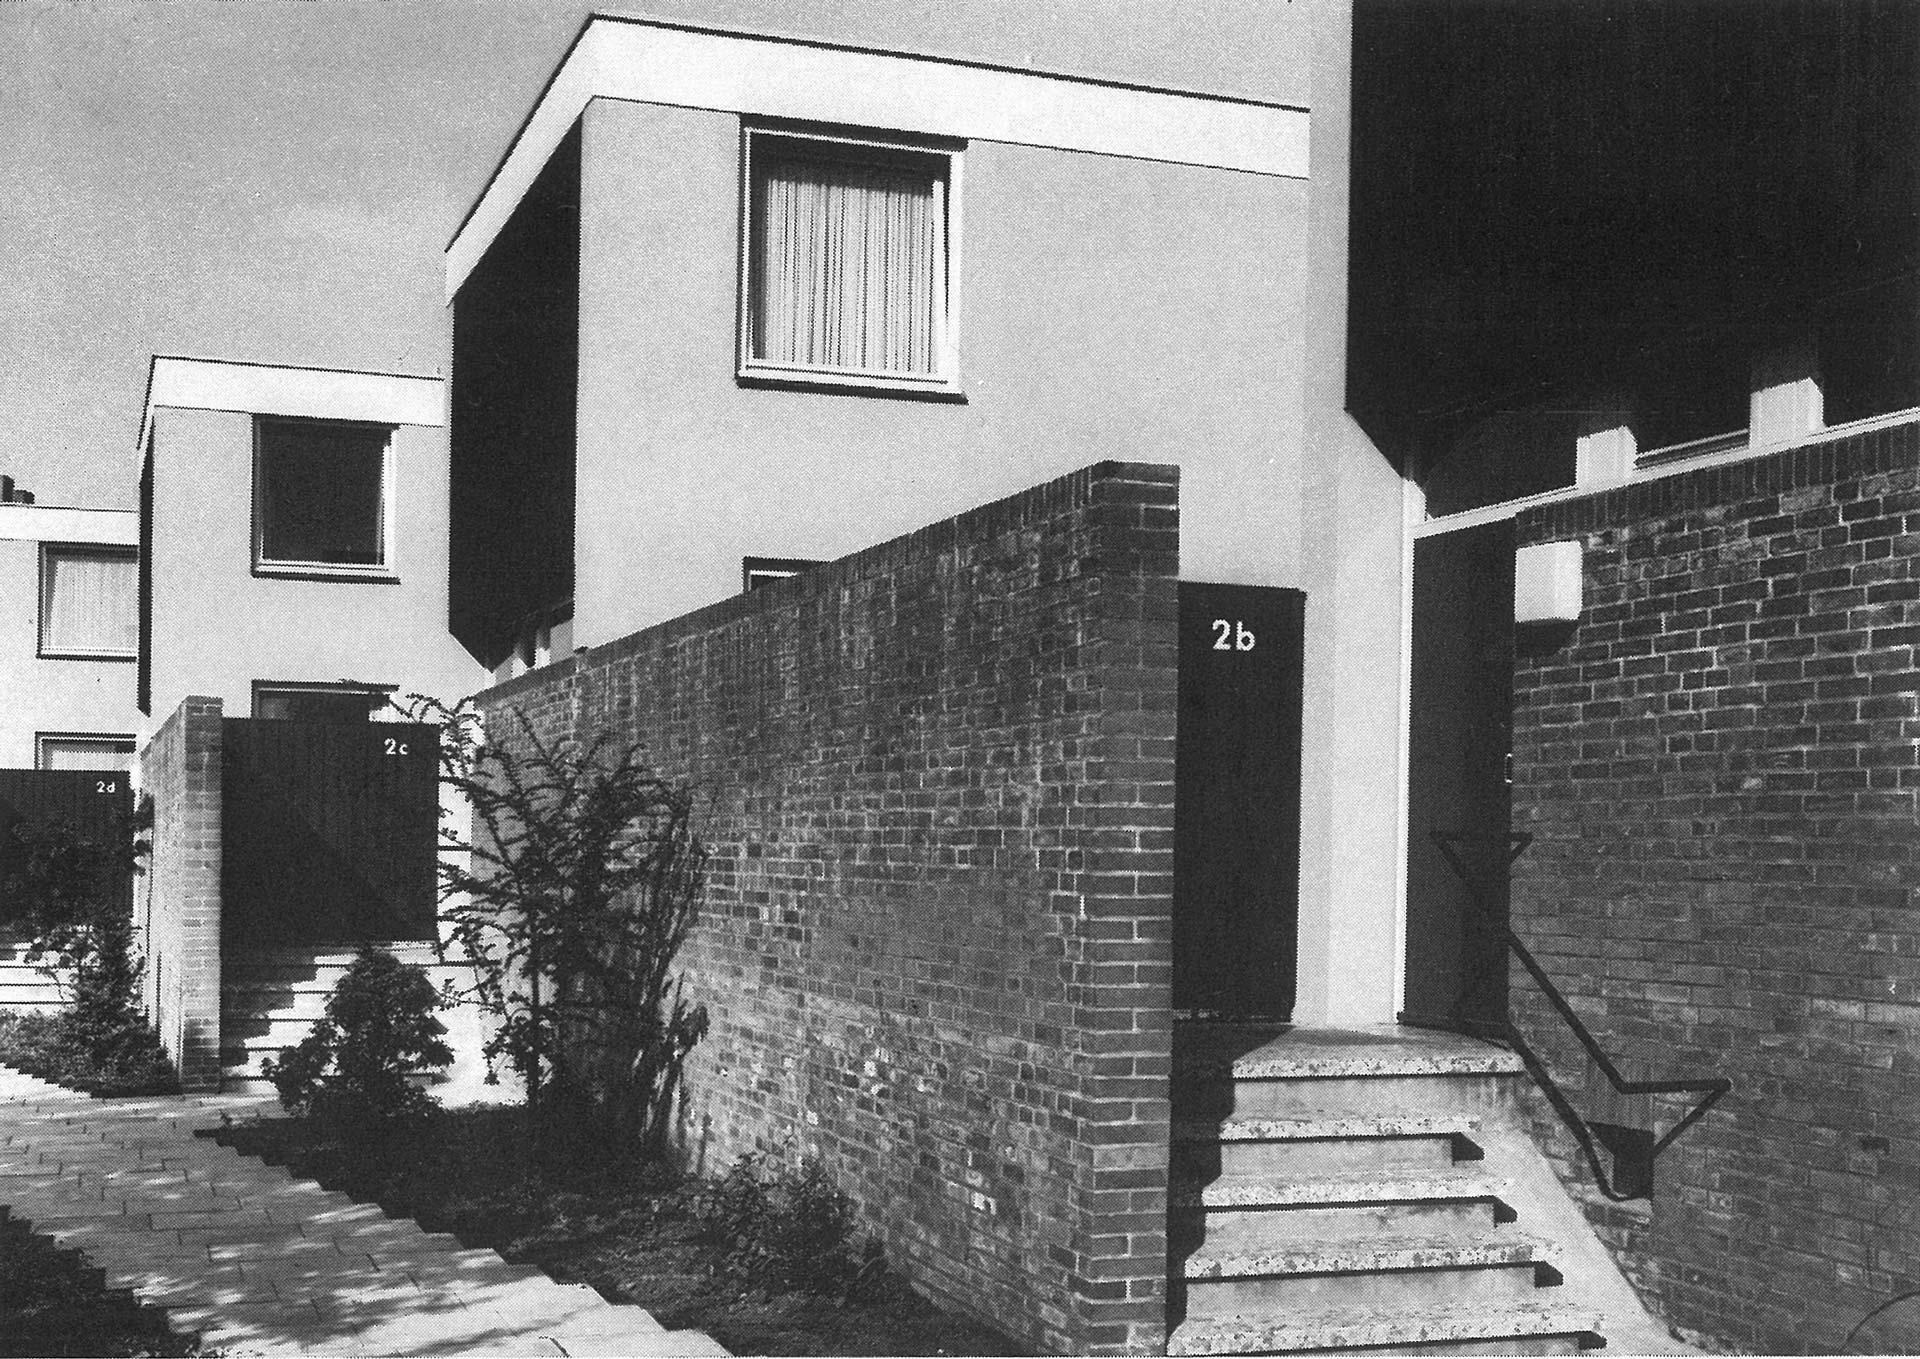 Klostergarten - Limbrock Tubbesing Architekten